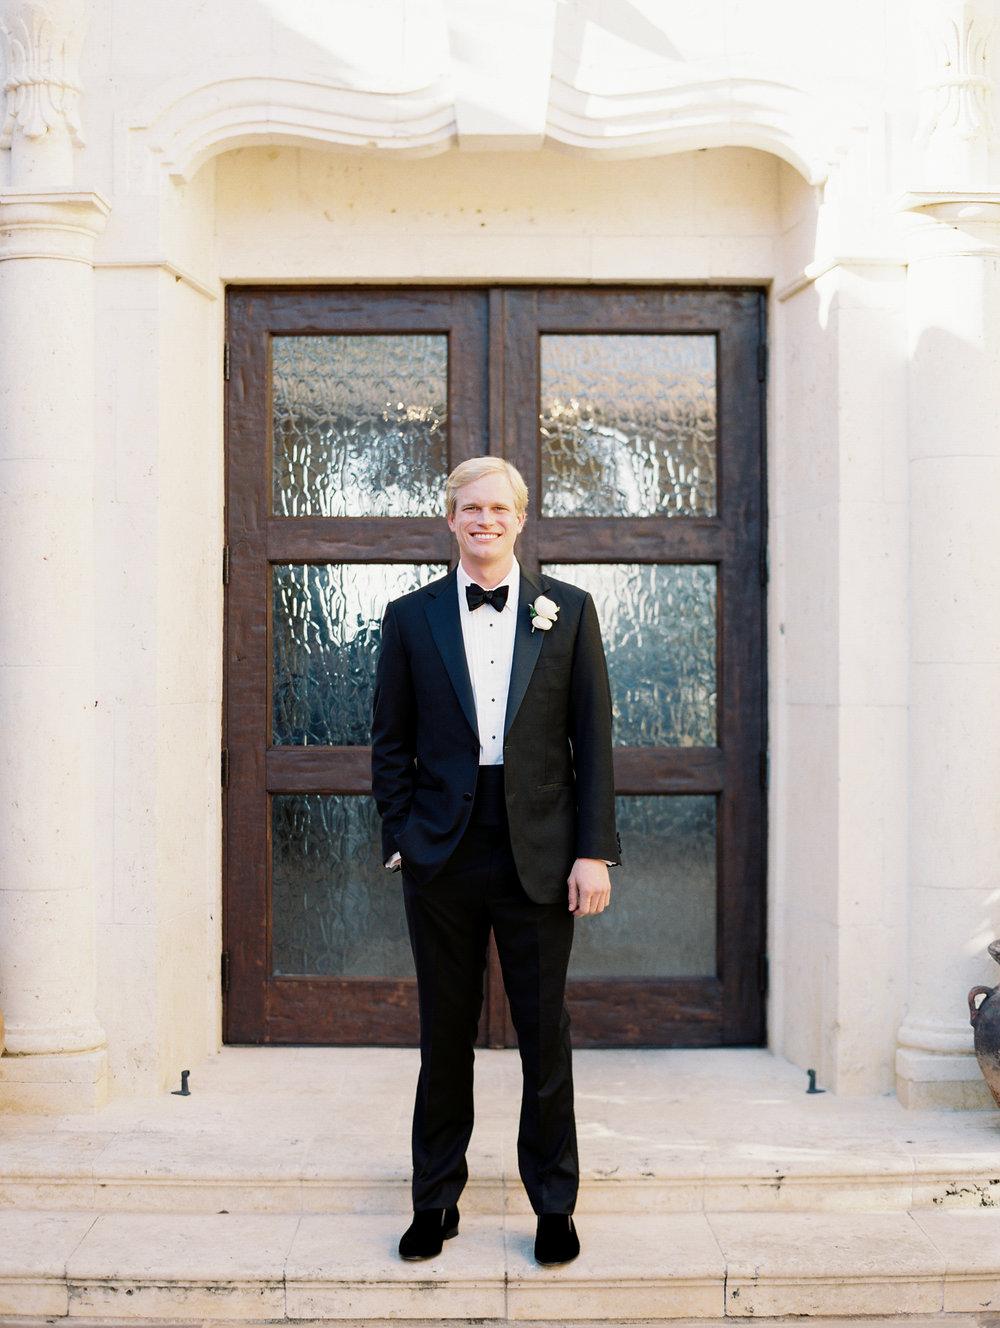 Escondido-Golf_Lake-Club-Hill-Country-Houston-Wedding-Photographer-Best-Top-Luxury-Destination-Engagements-Portrait-Austin-Photography-24.jpg